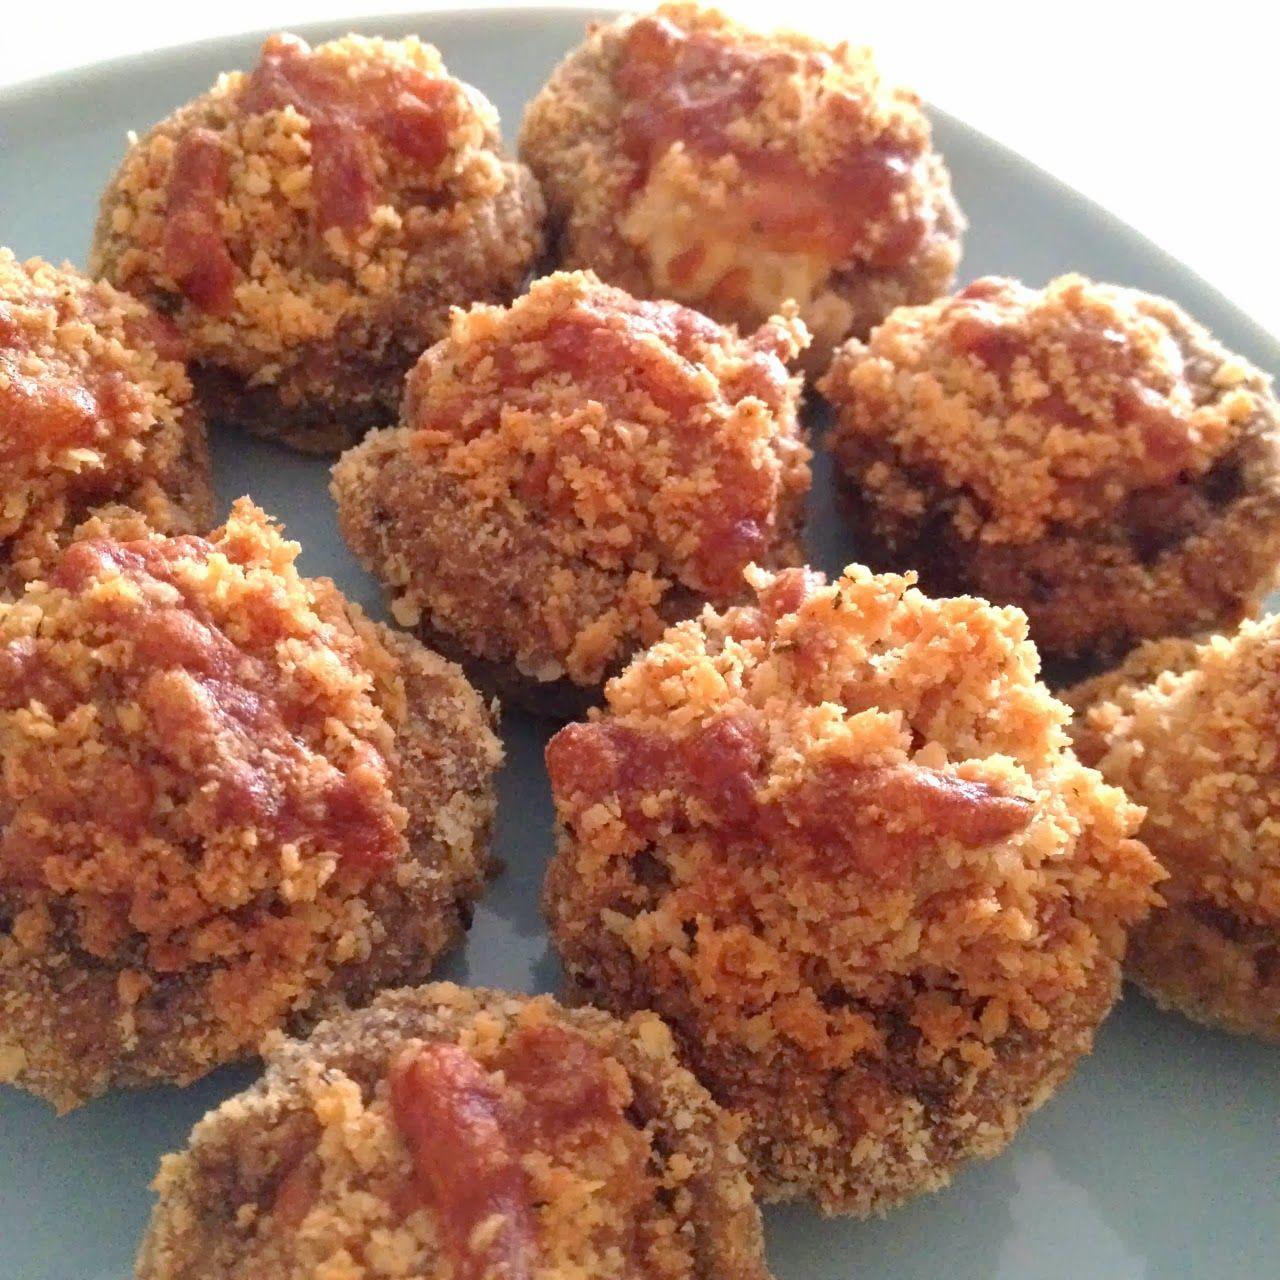 Crusted Parmesan Mushrooms (Air Fryer Recipe) Air fryer